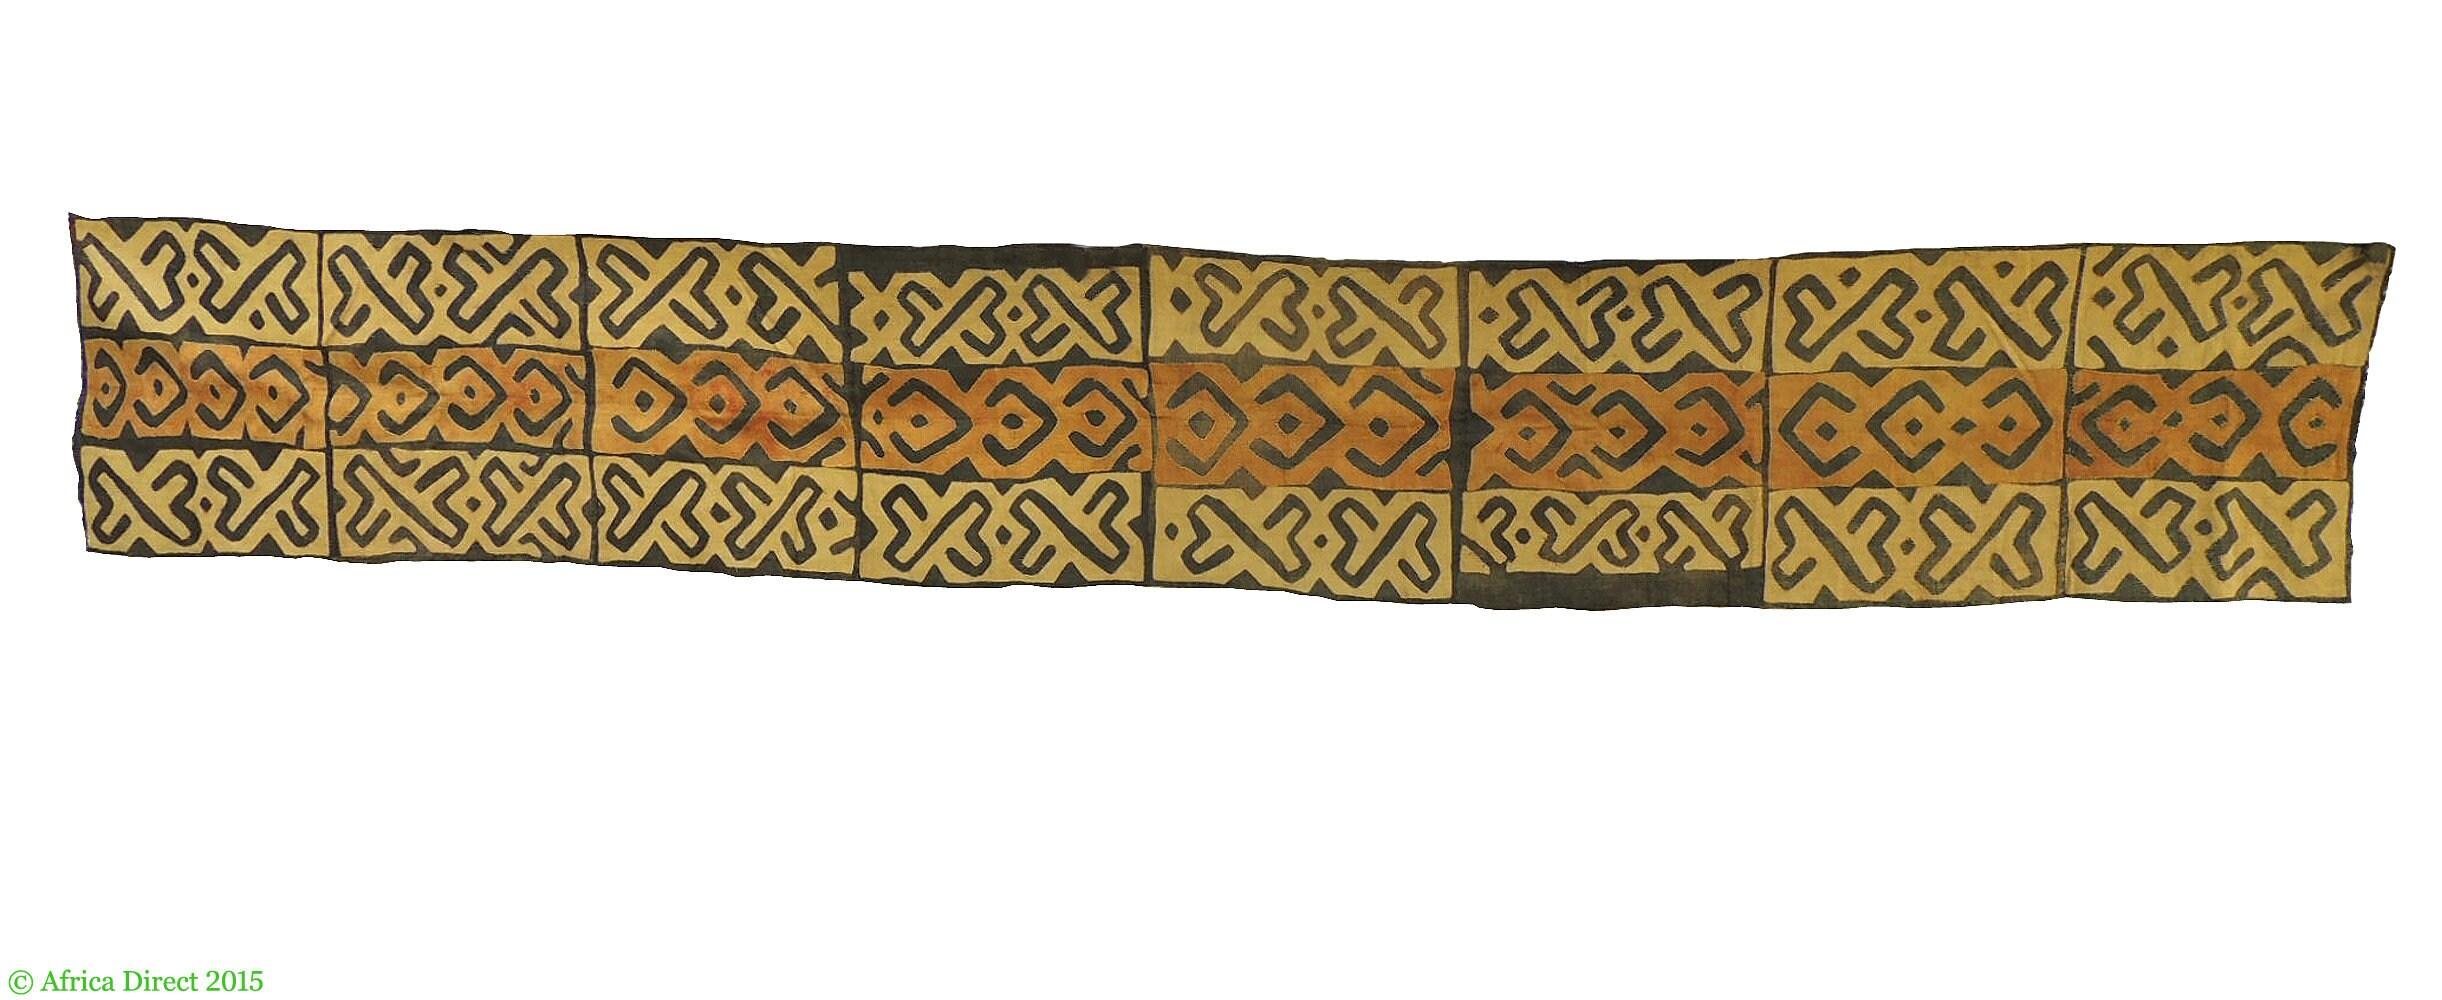 Kuba Textile Handwoven Handwoven Handwoven Appliquéd Raffia Congo 14 feet Africa 97863 28033b